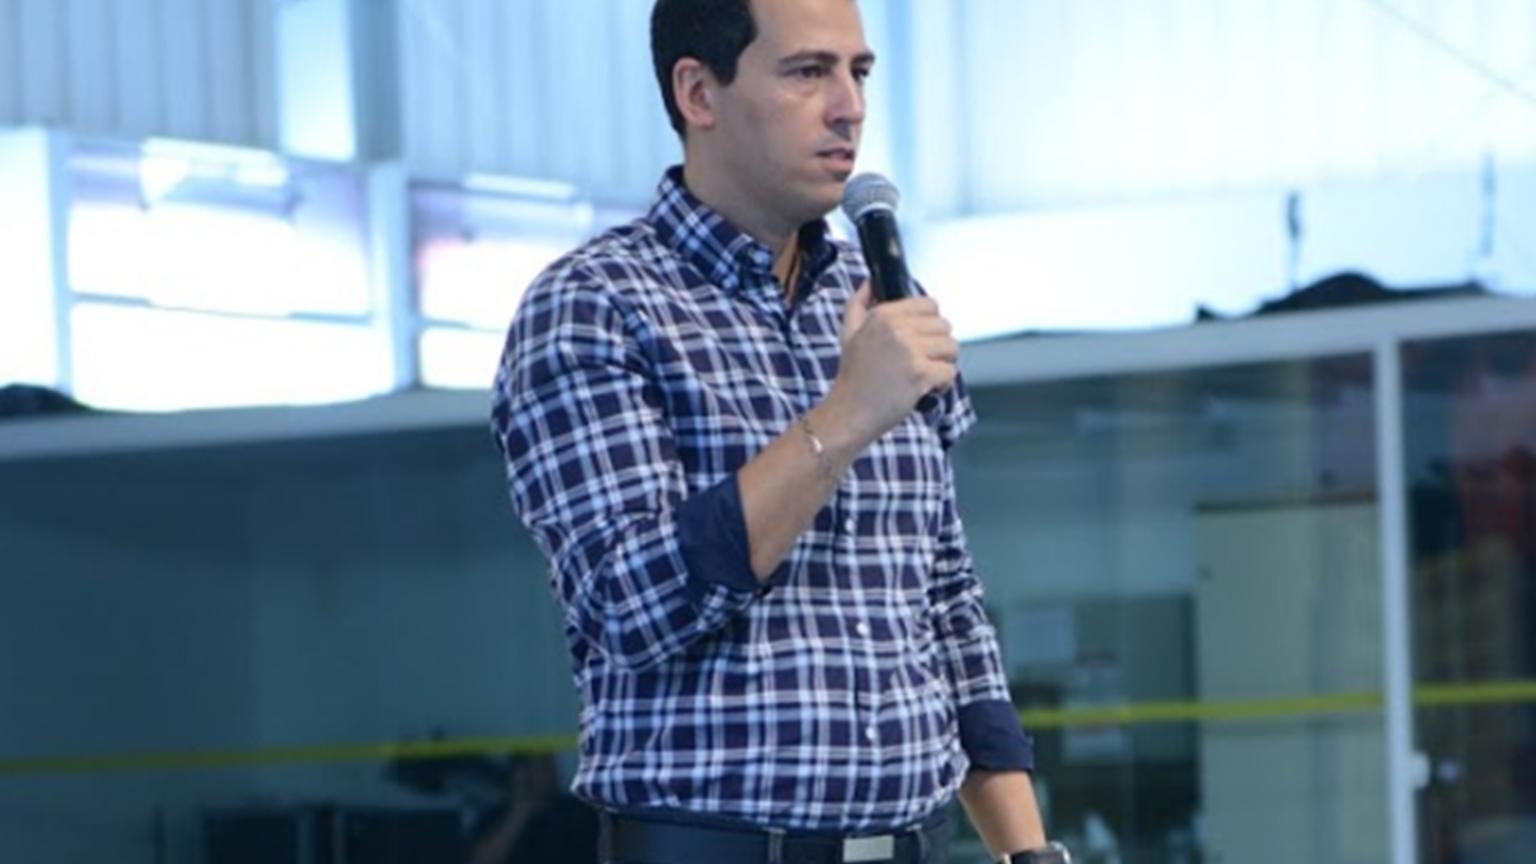 Carlos-Biajoni-1536x864.png